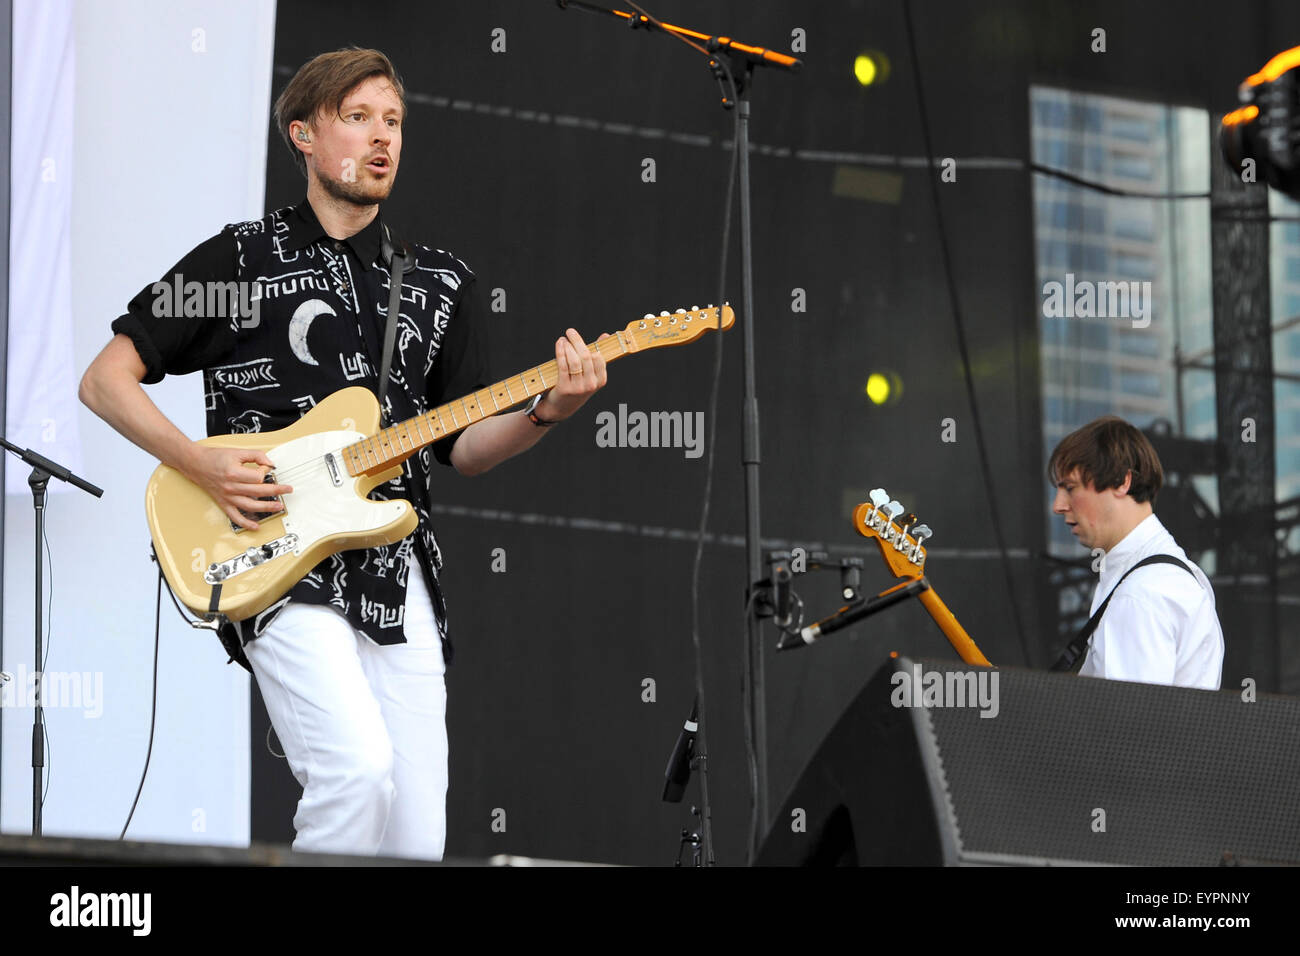 Grant Park. 01st Aug, 2015. August 01, 2015. - Djandgo Django performing live during the Lollapalooza Festival 2015 - Stock Image